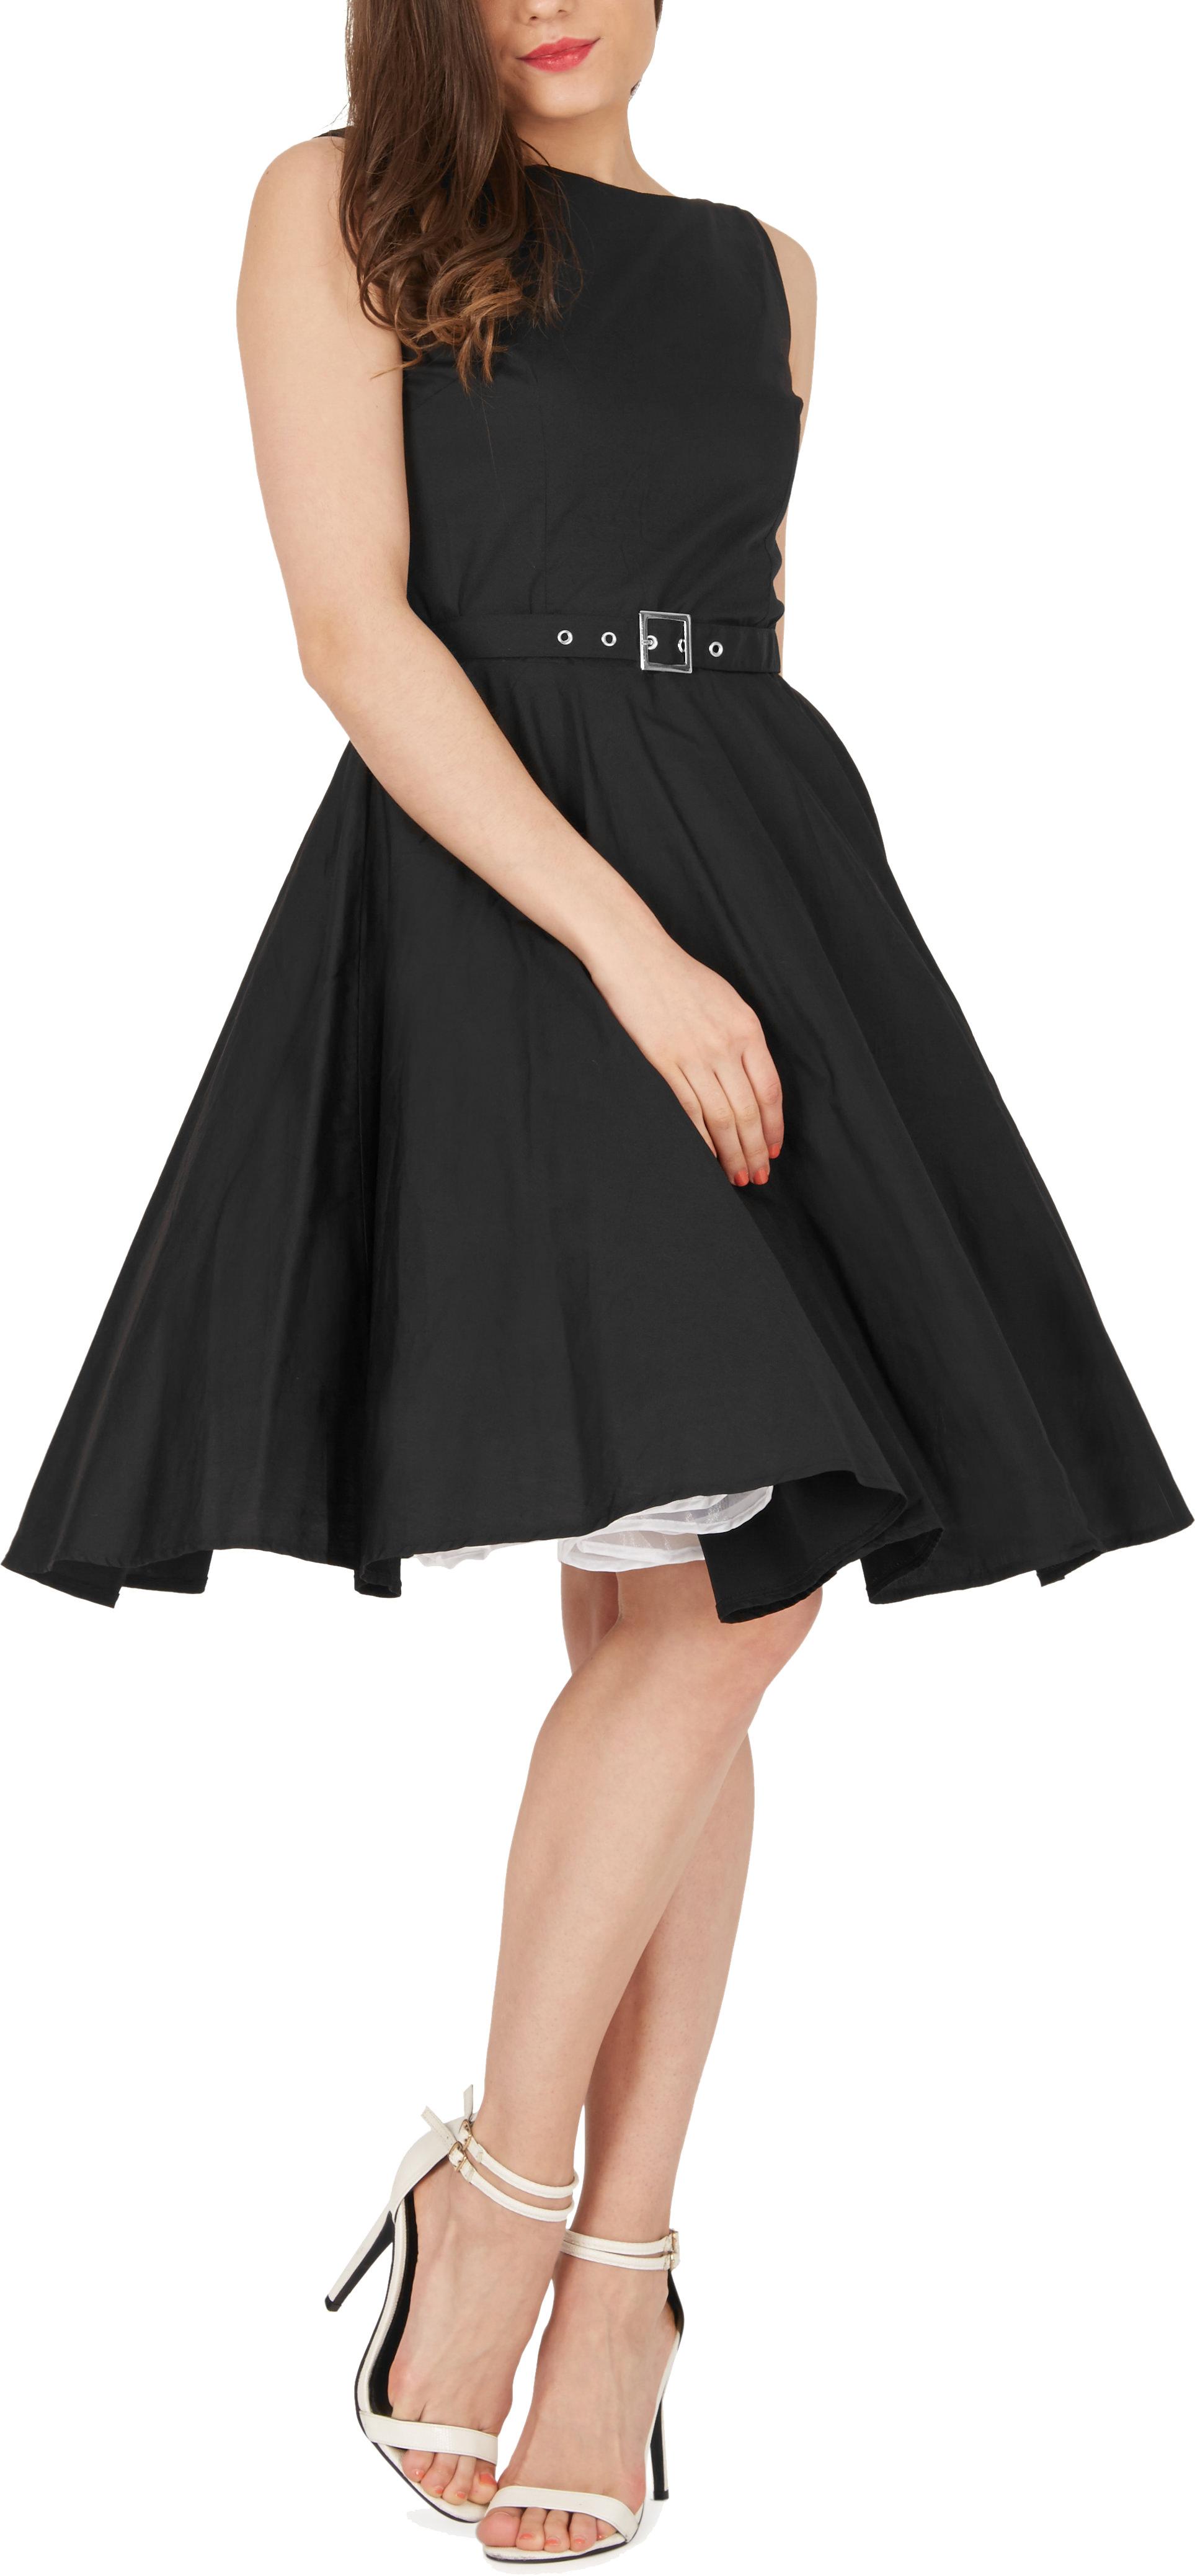 blackbutterfly robe ann es 50 vintage hepburn swing. Black Bedroom Furniture Sets. Home Design Ideas